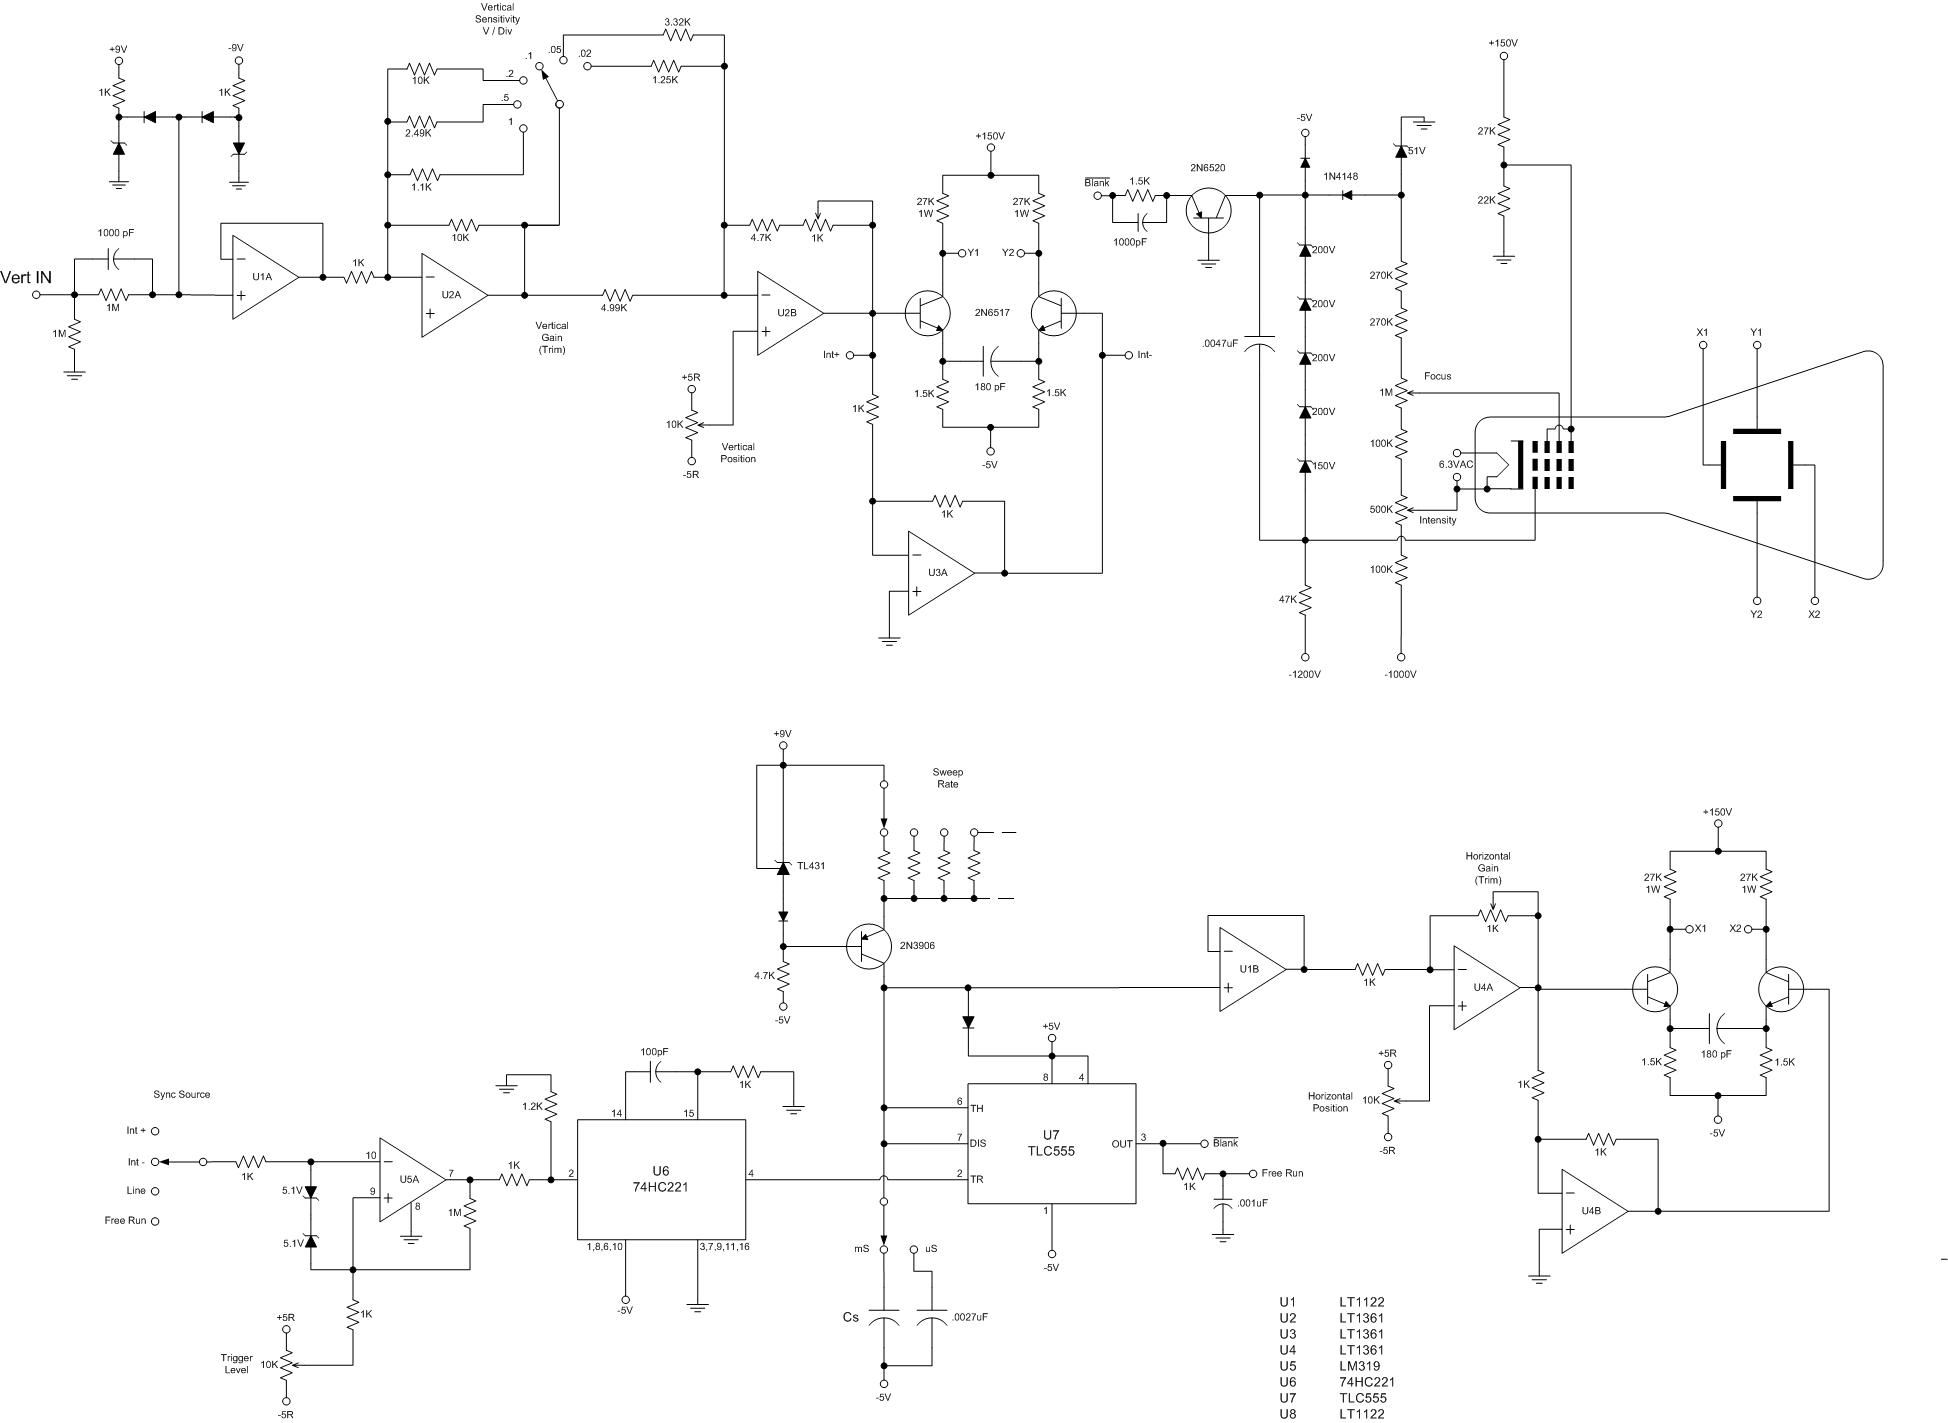 Scope Schematics W2iog Project Page Click